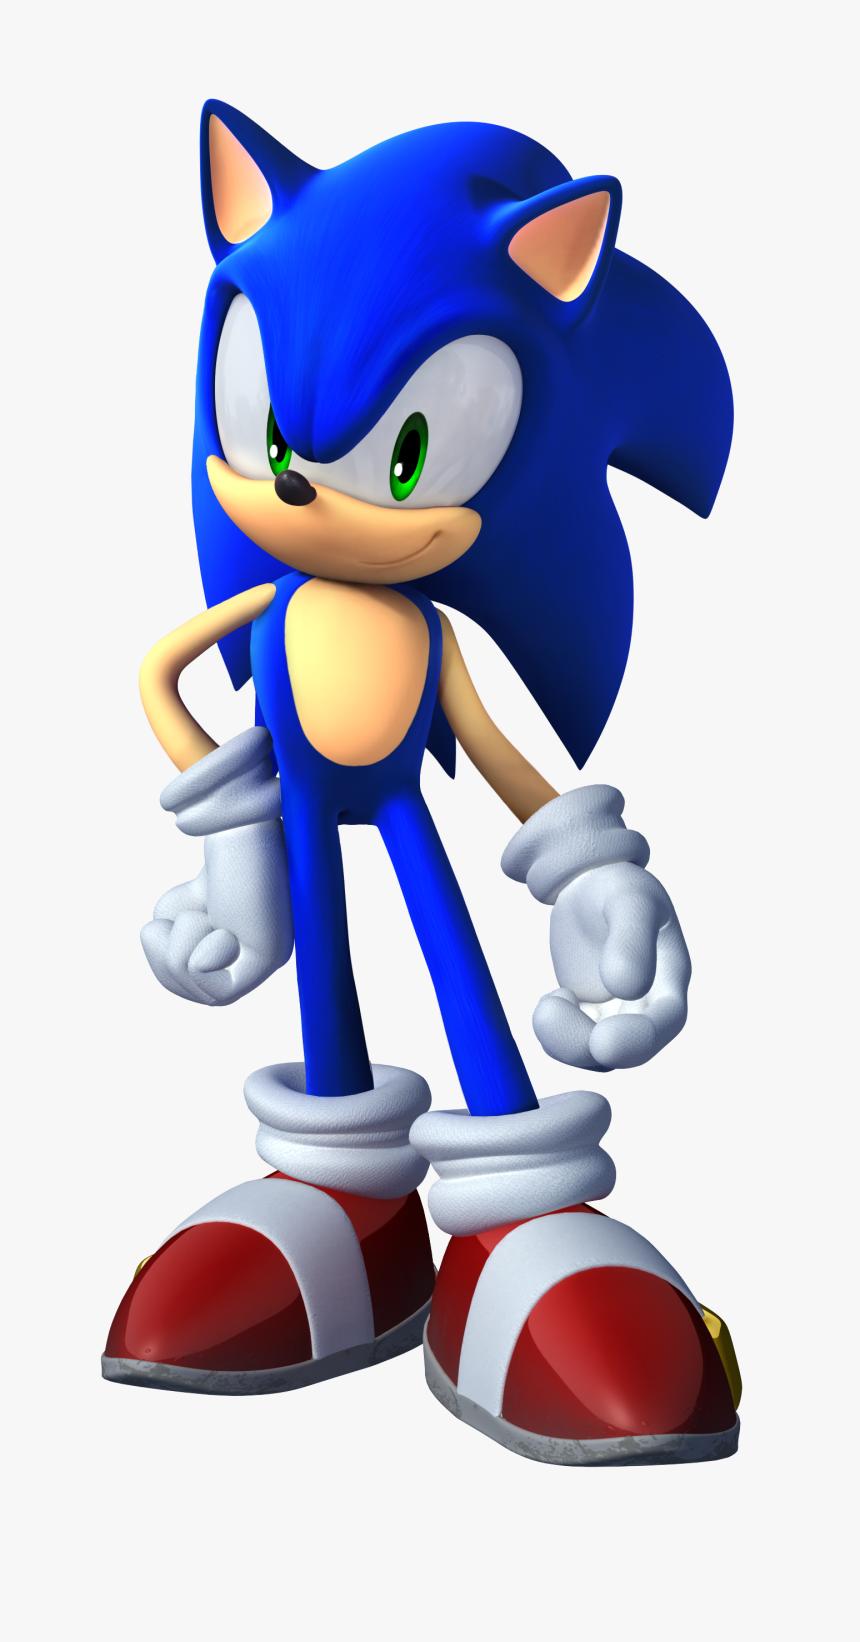 sonic the hedgehog logo transparent background